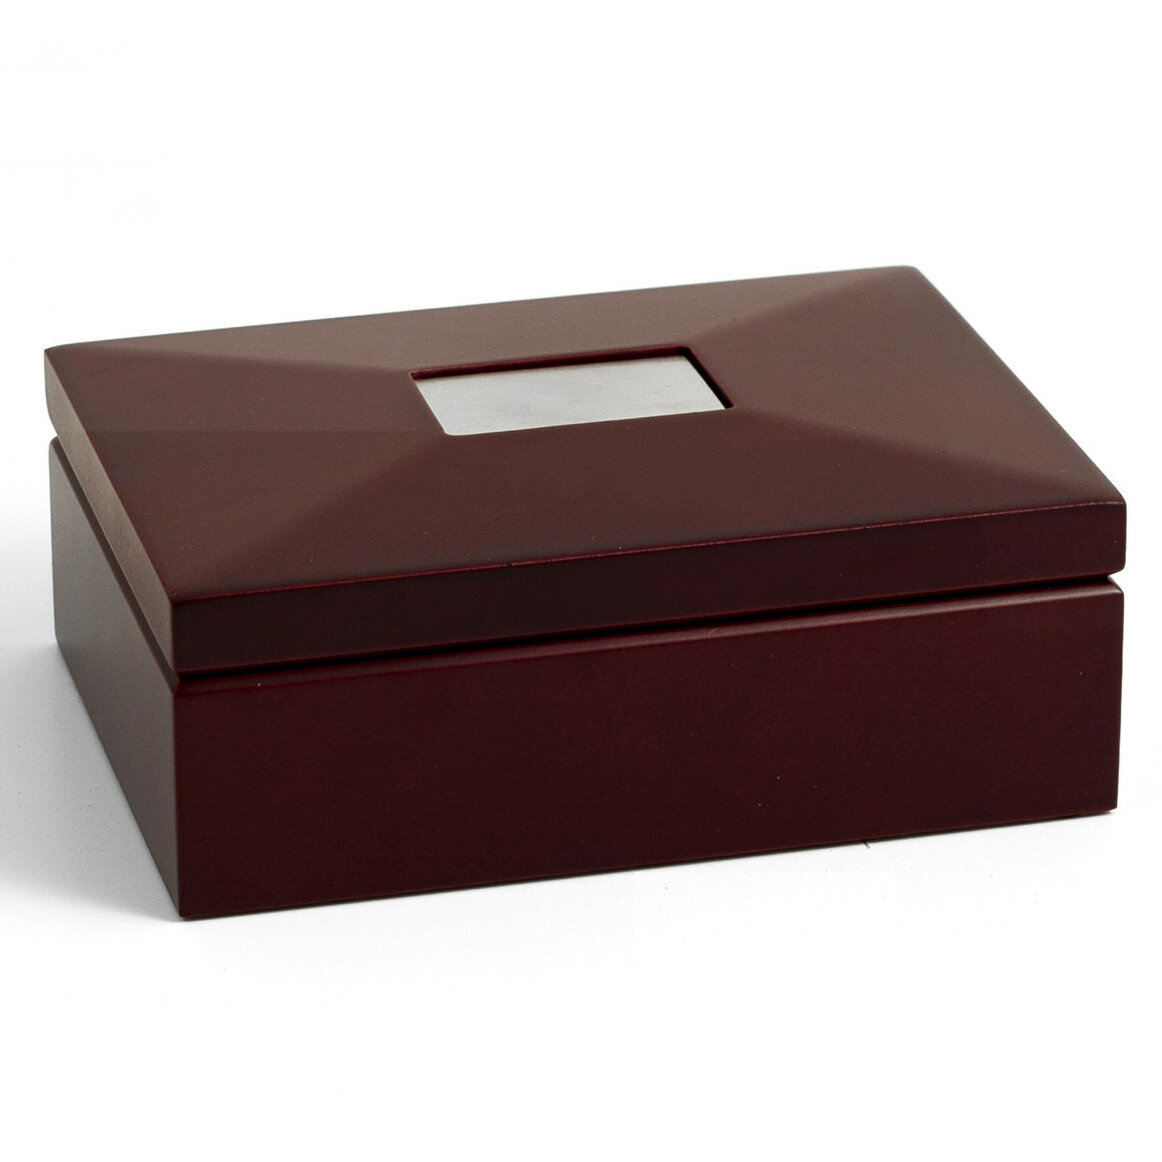 Bey berk hinged keepsakes jewelry box ebay for Bey berk jewelry box